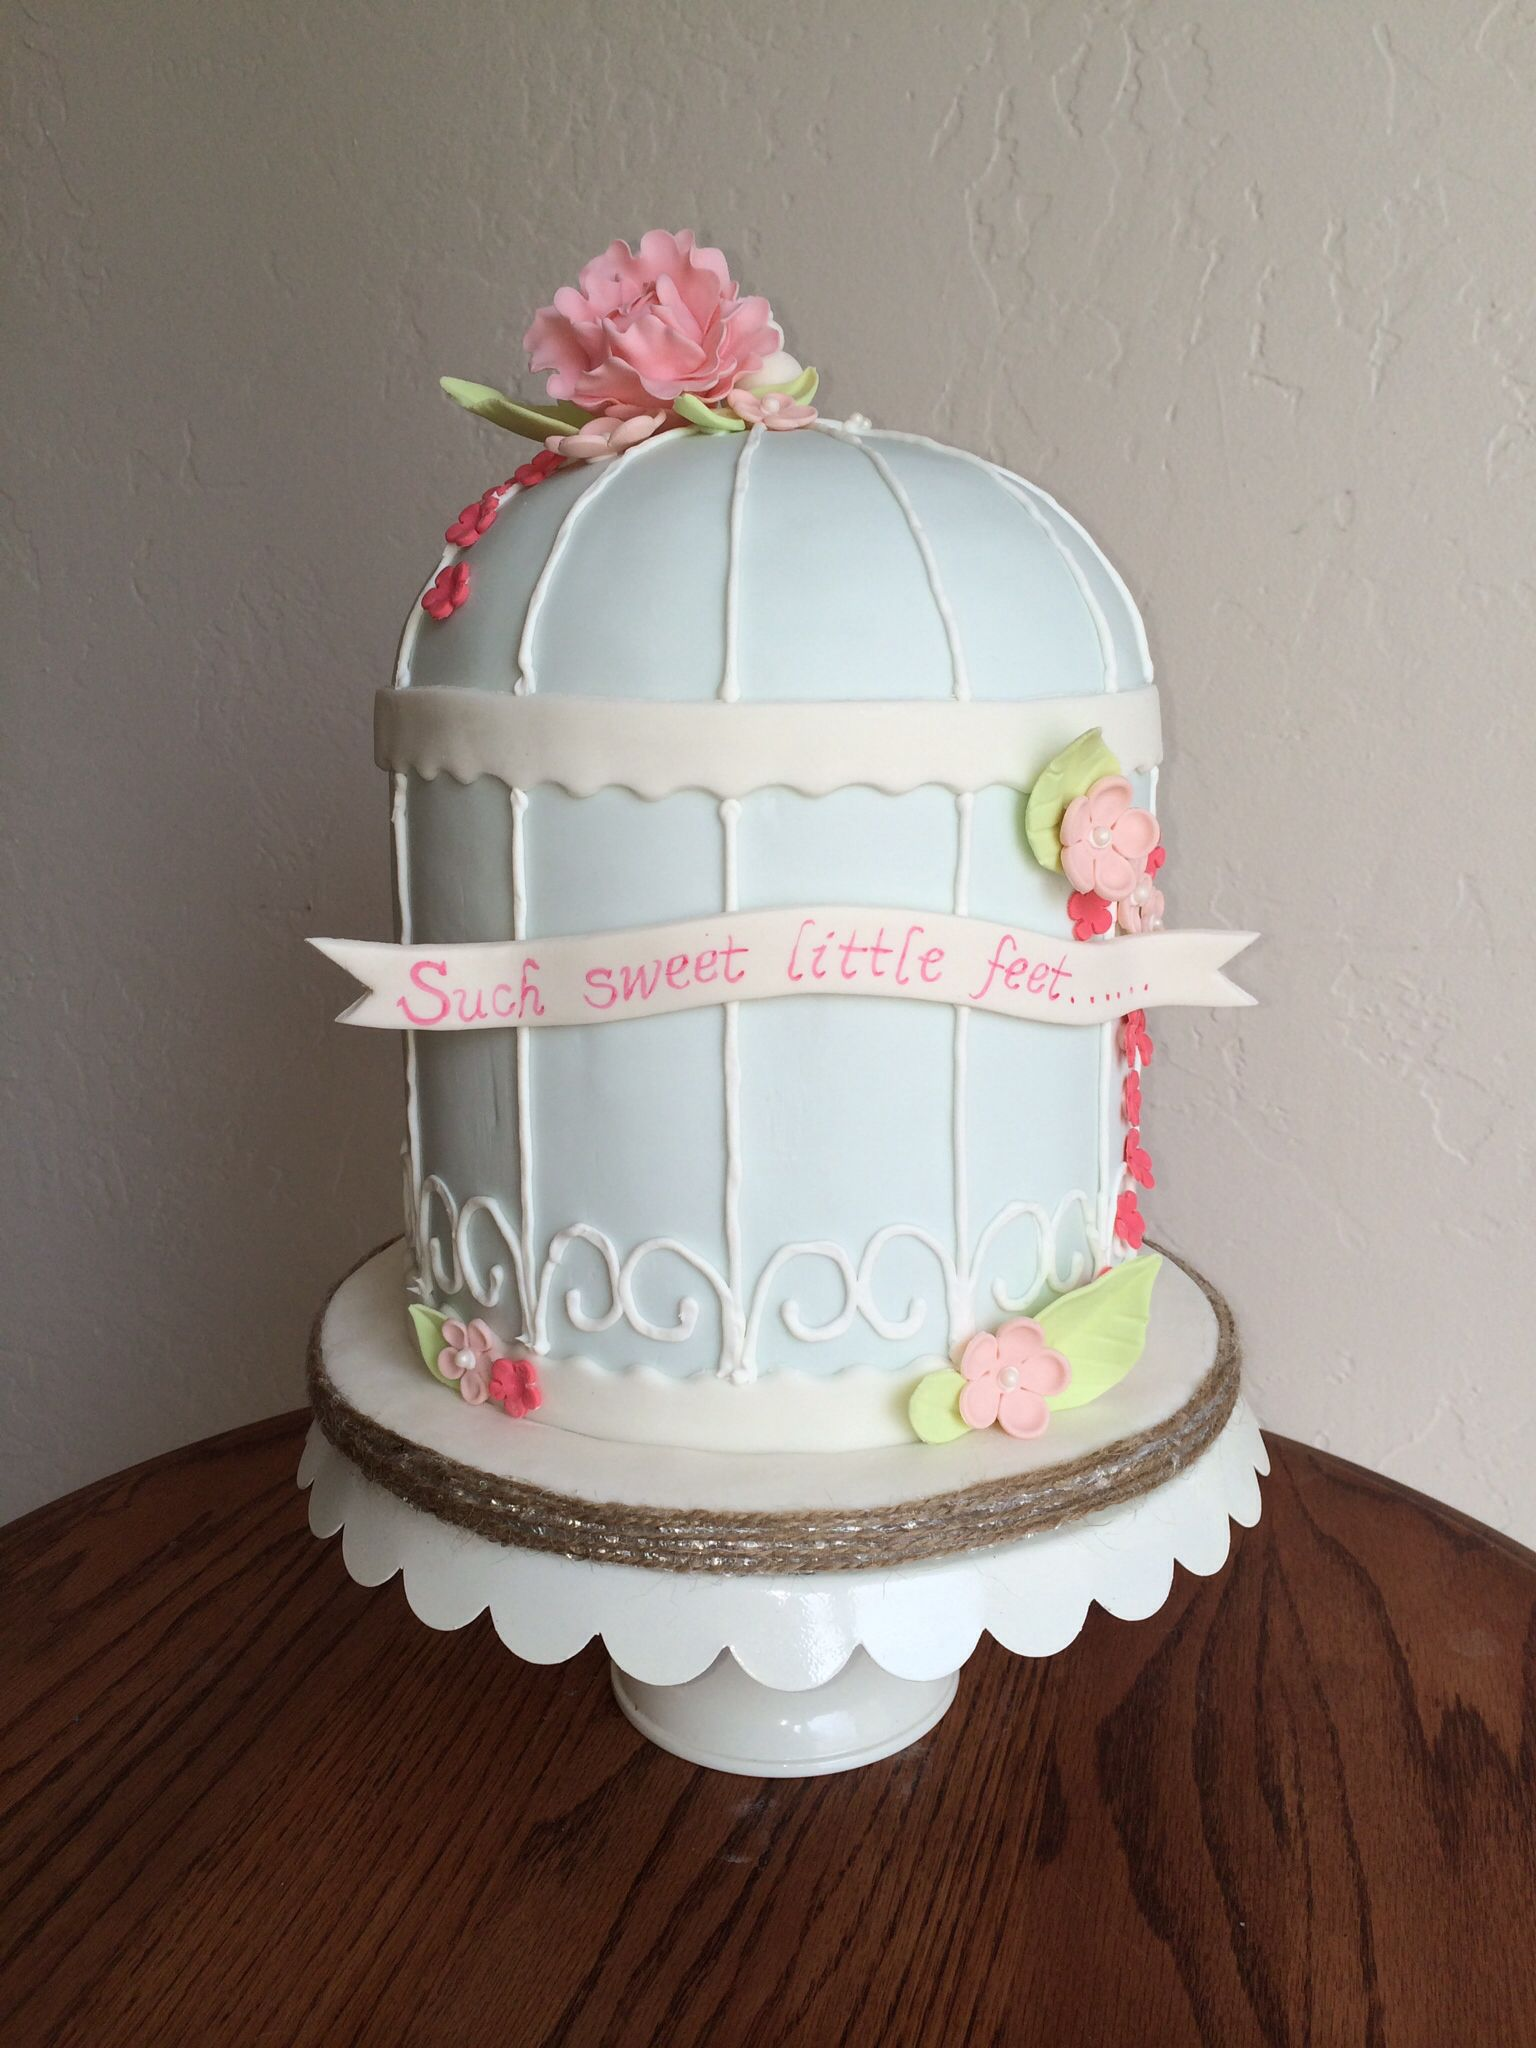 Cool Custom Birthday Cakes Fresno Ca Yummimages Funny Birthday Cards Online Alyptdamsfinfo